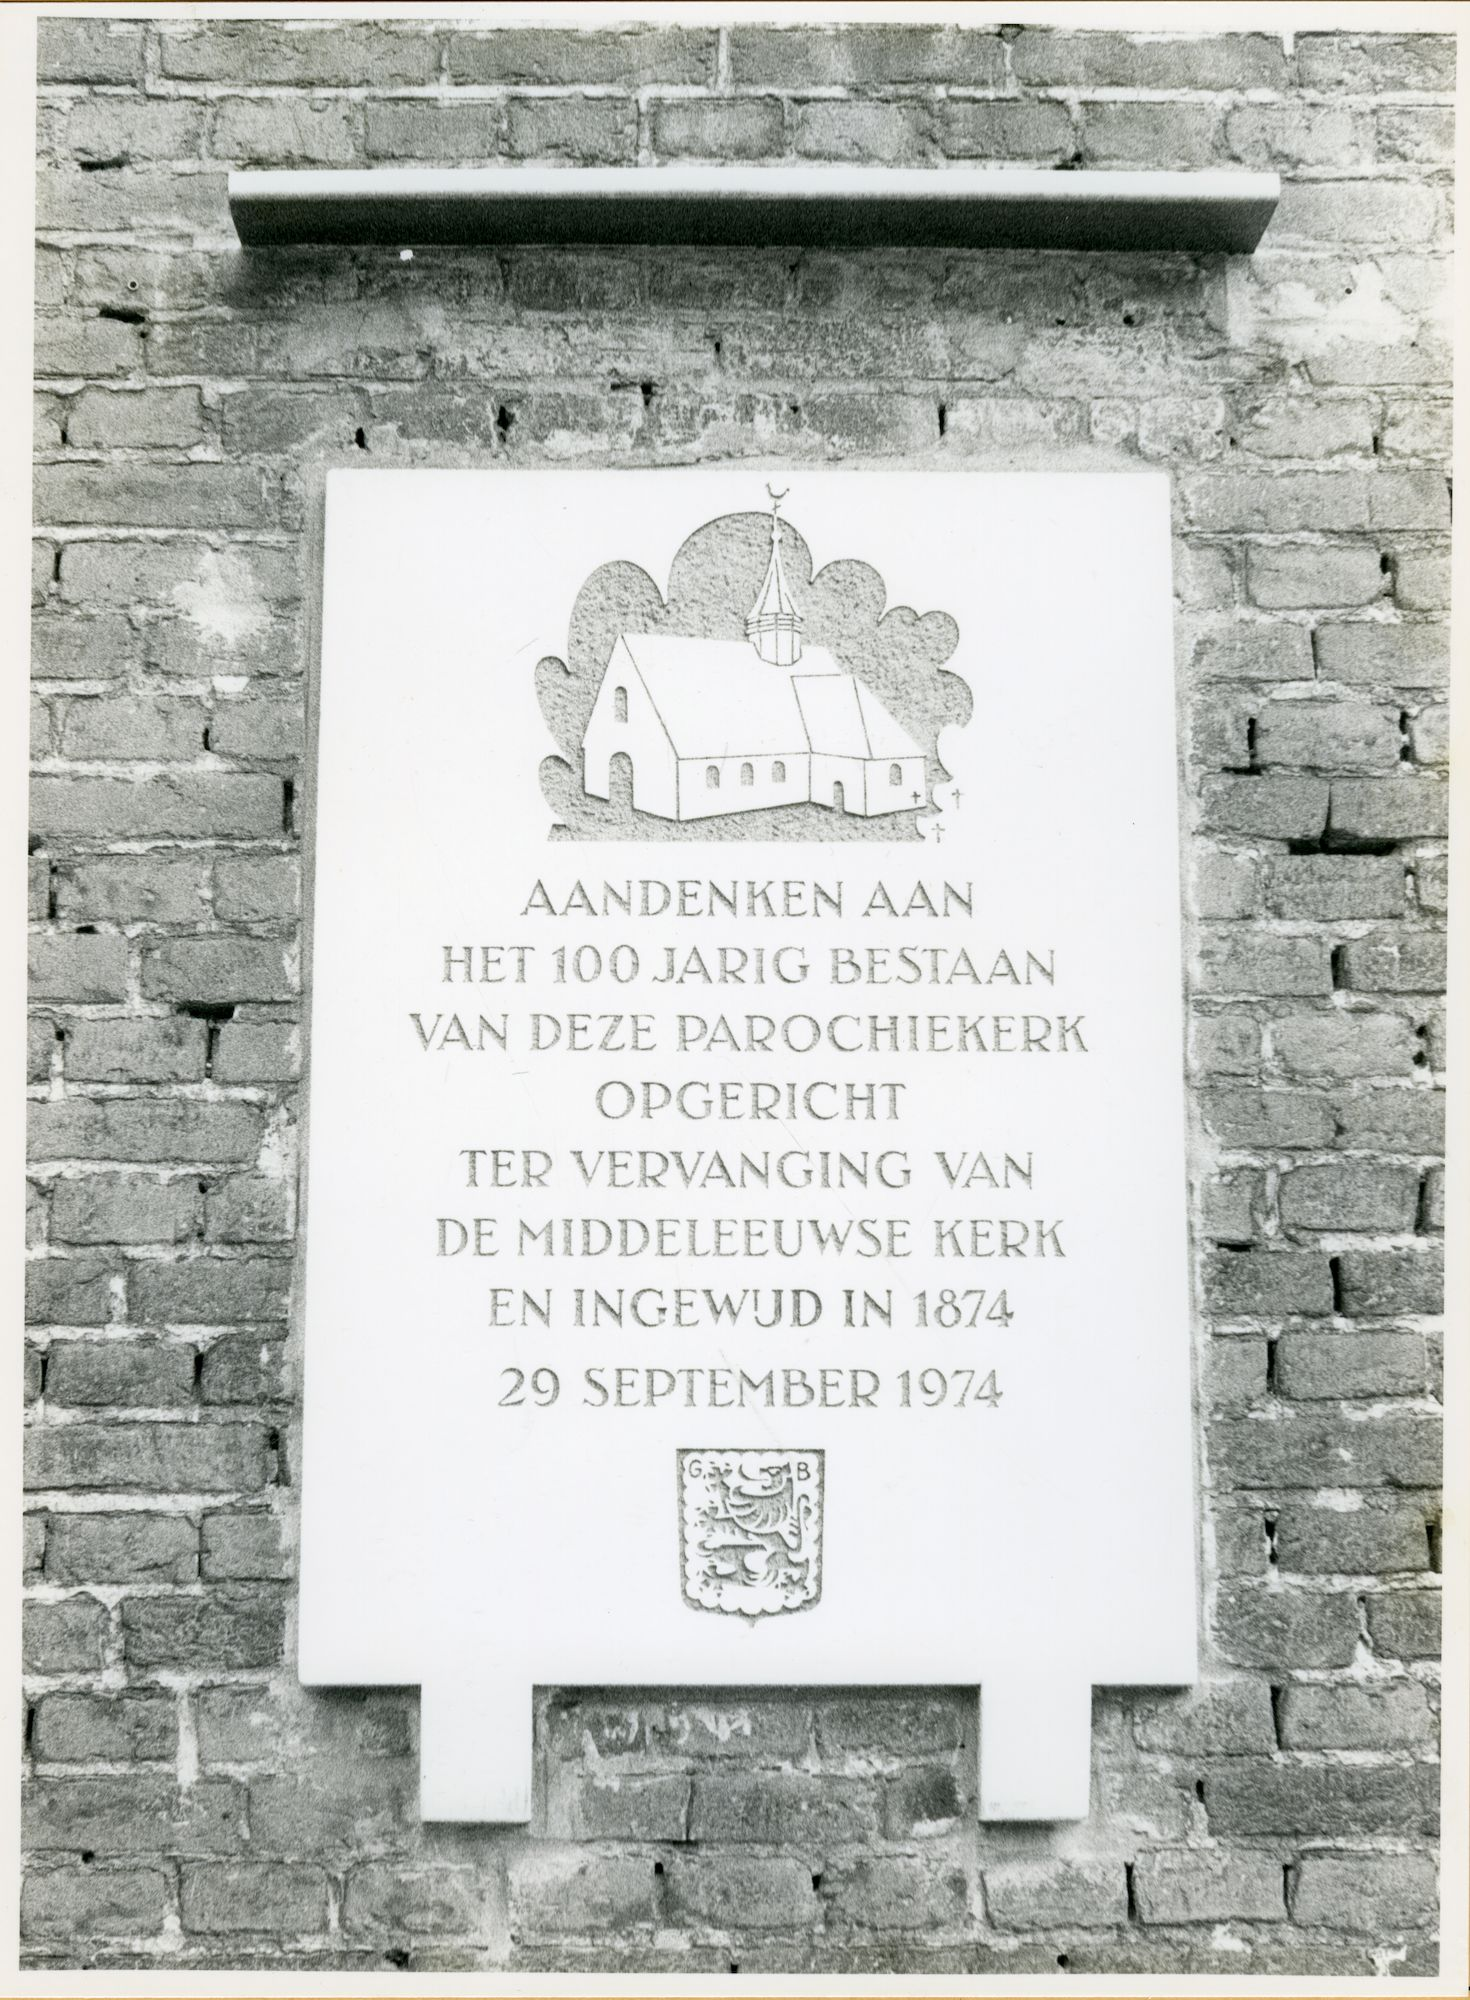 Gentbrugge: Gentbruggeplein: Gedenksteen, 1979